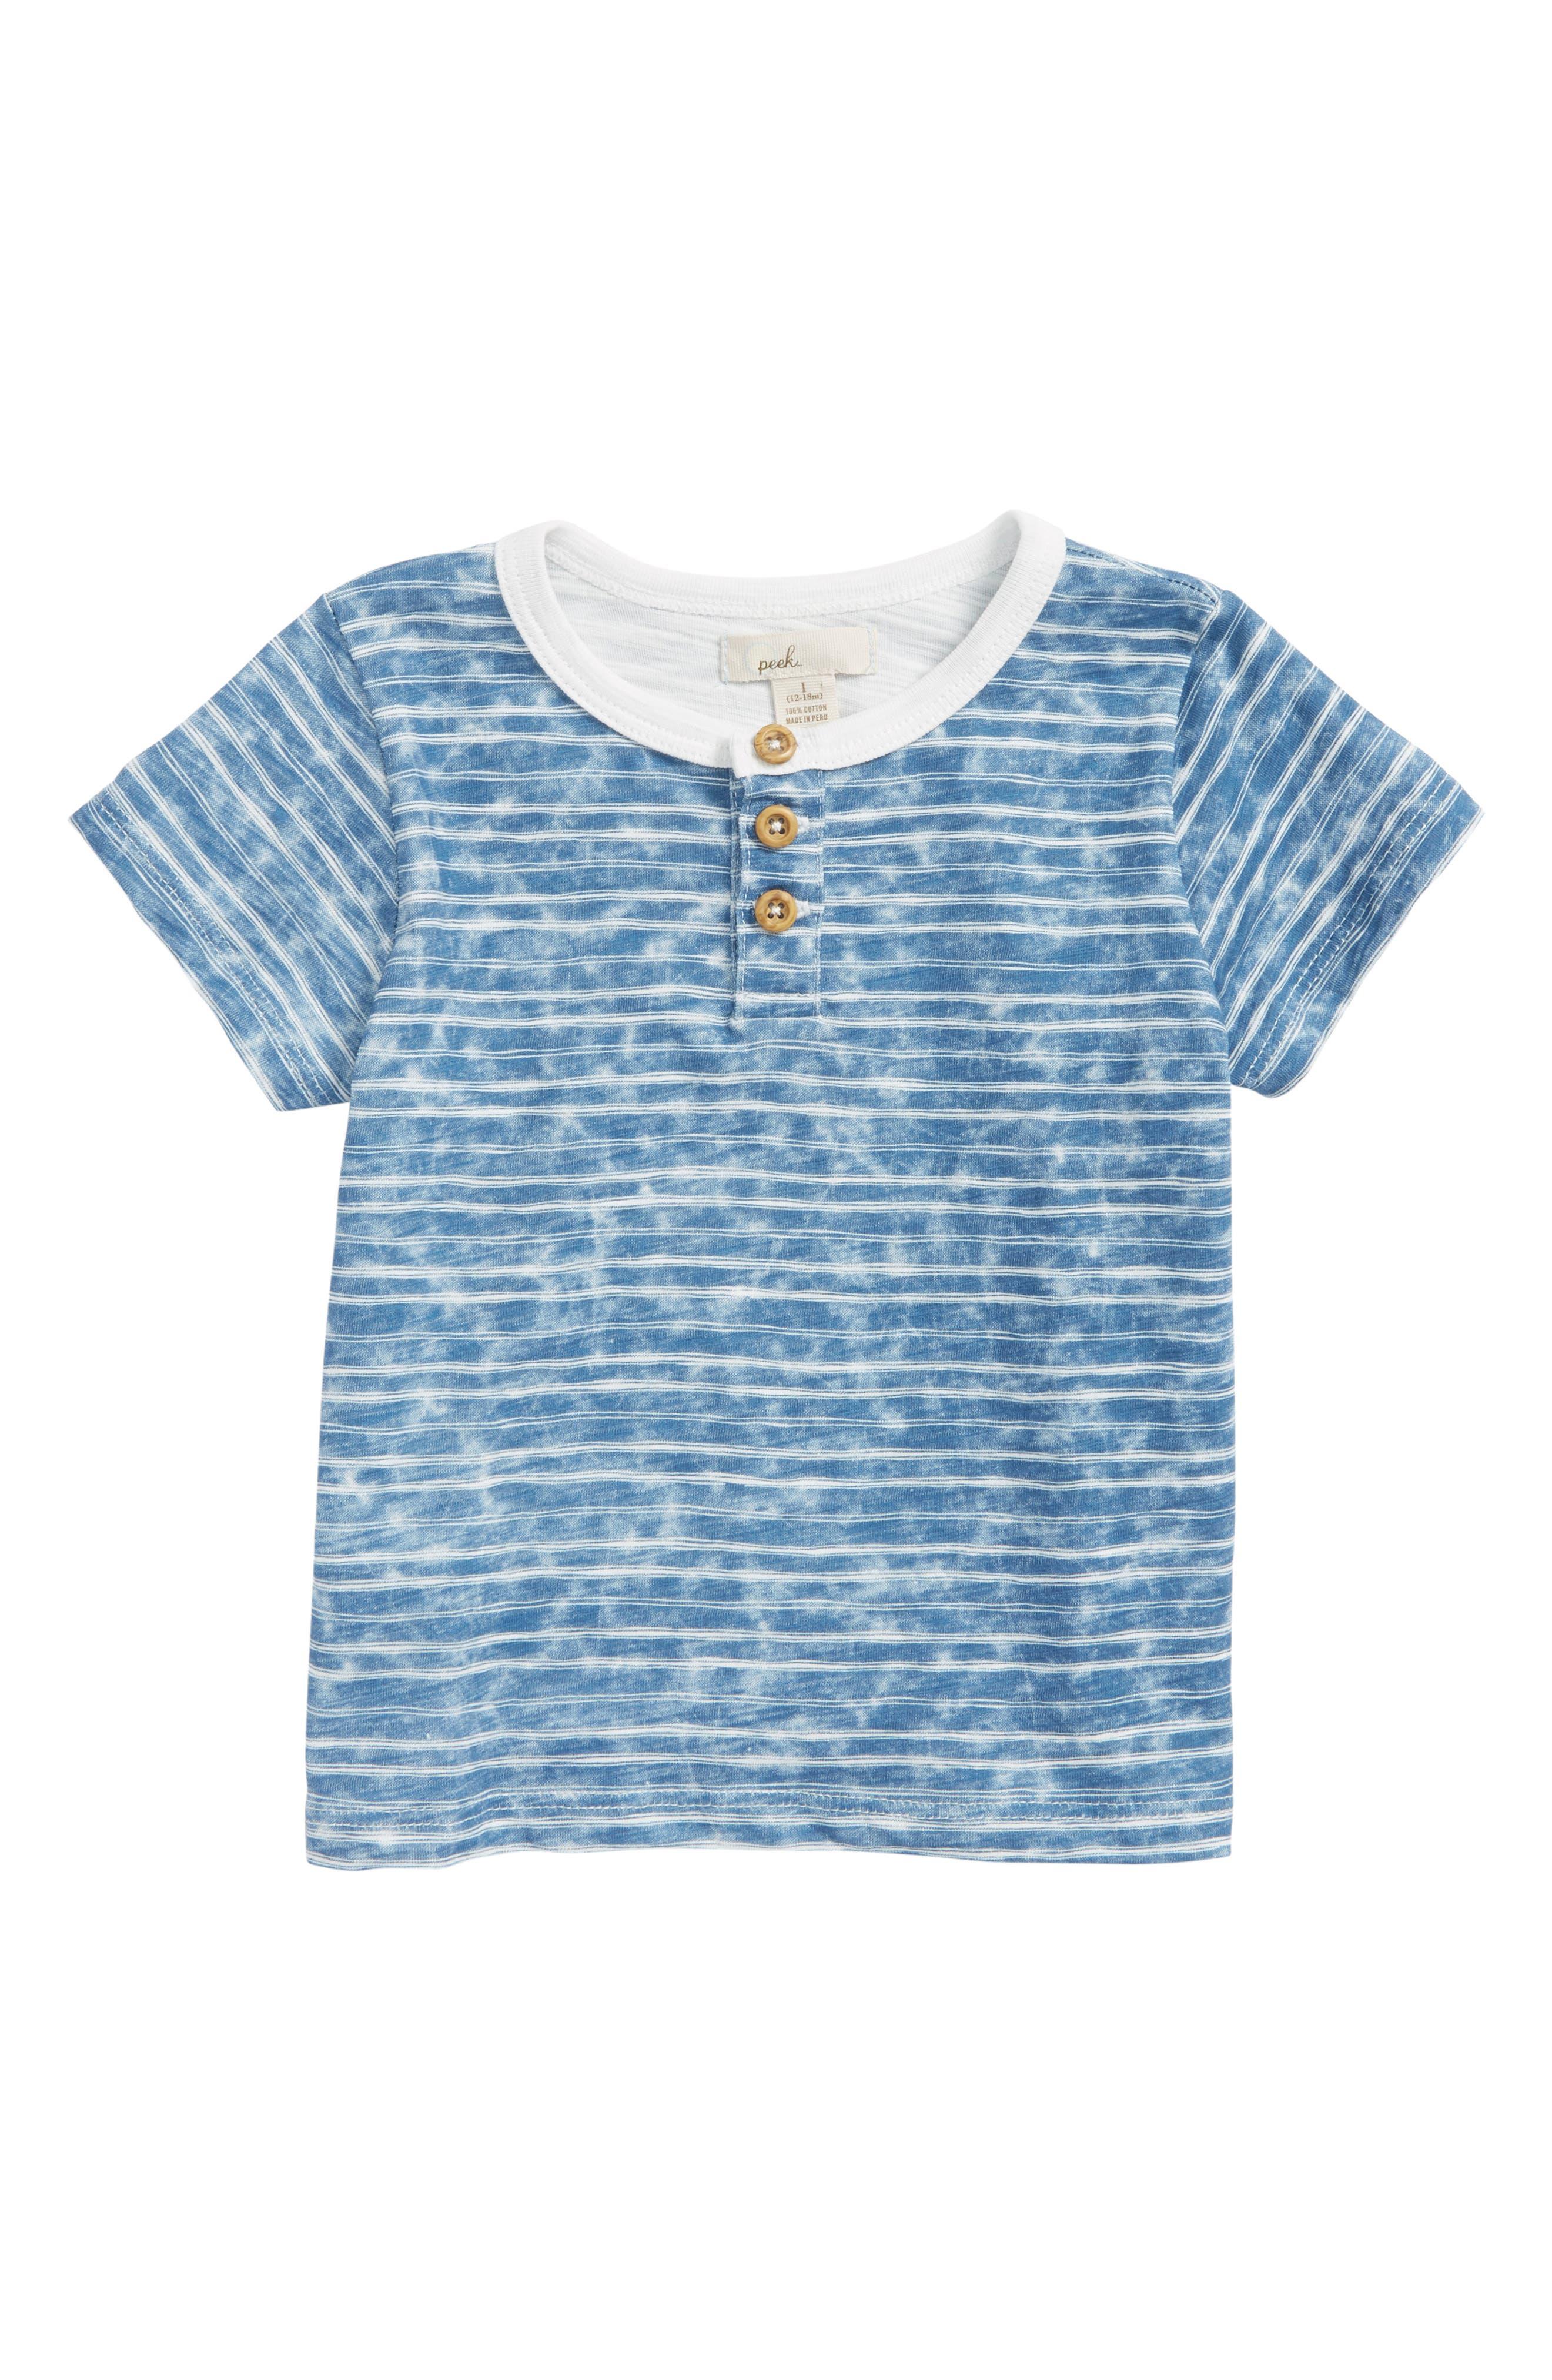 Peek Brandon T-Shirt,                             Main thumbnail 1, color,                             Navy